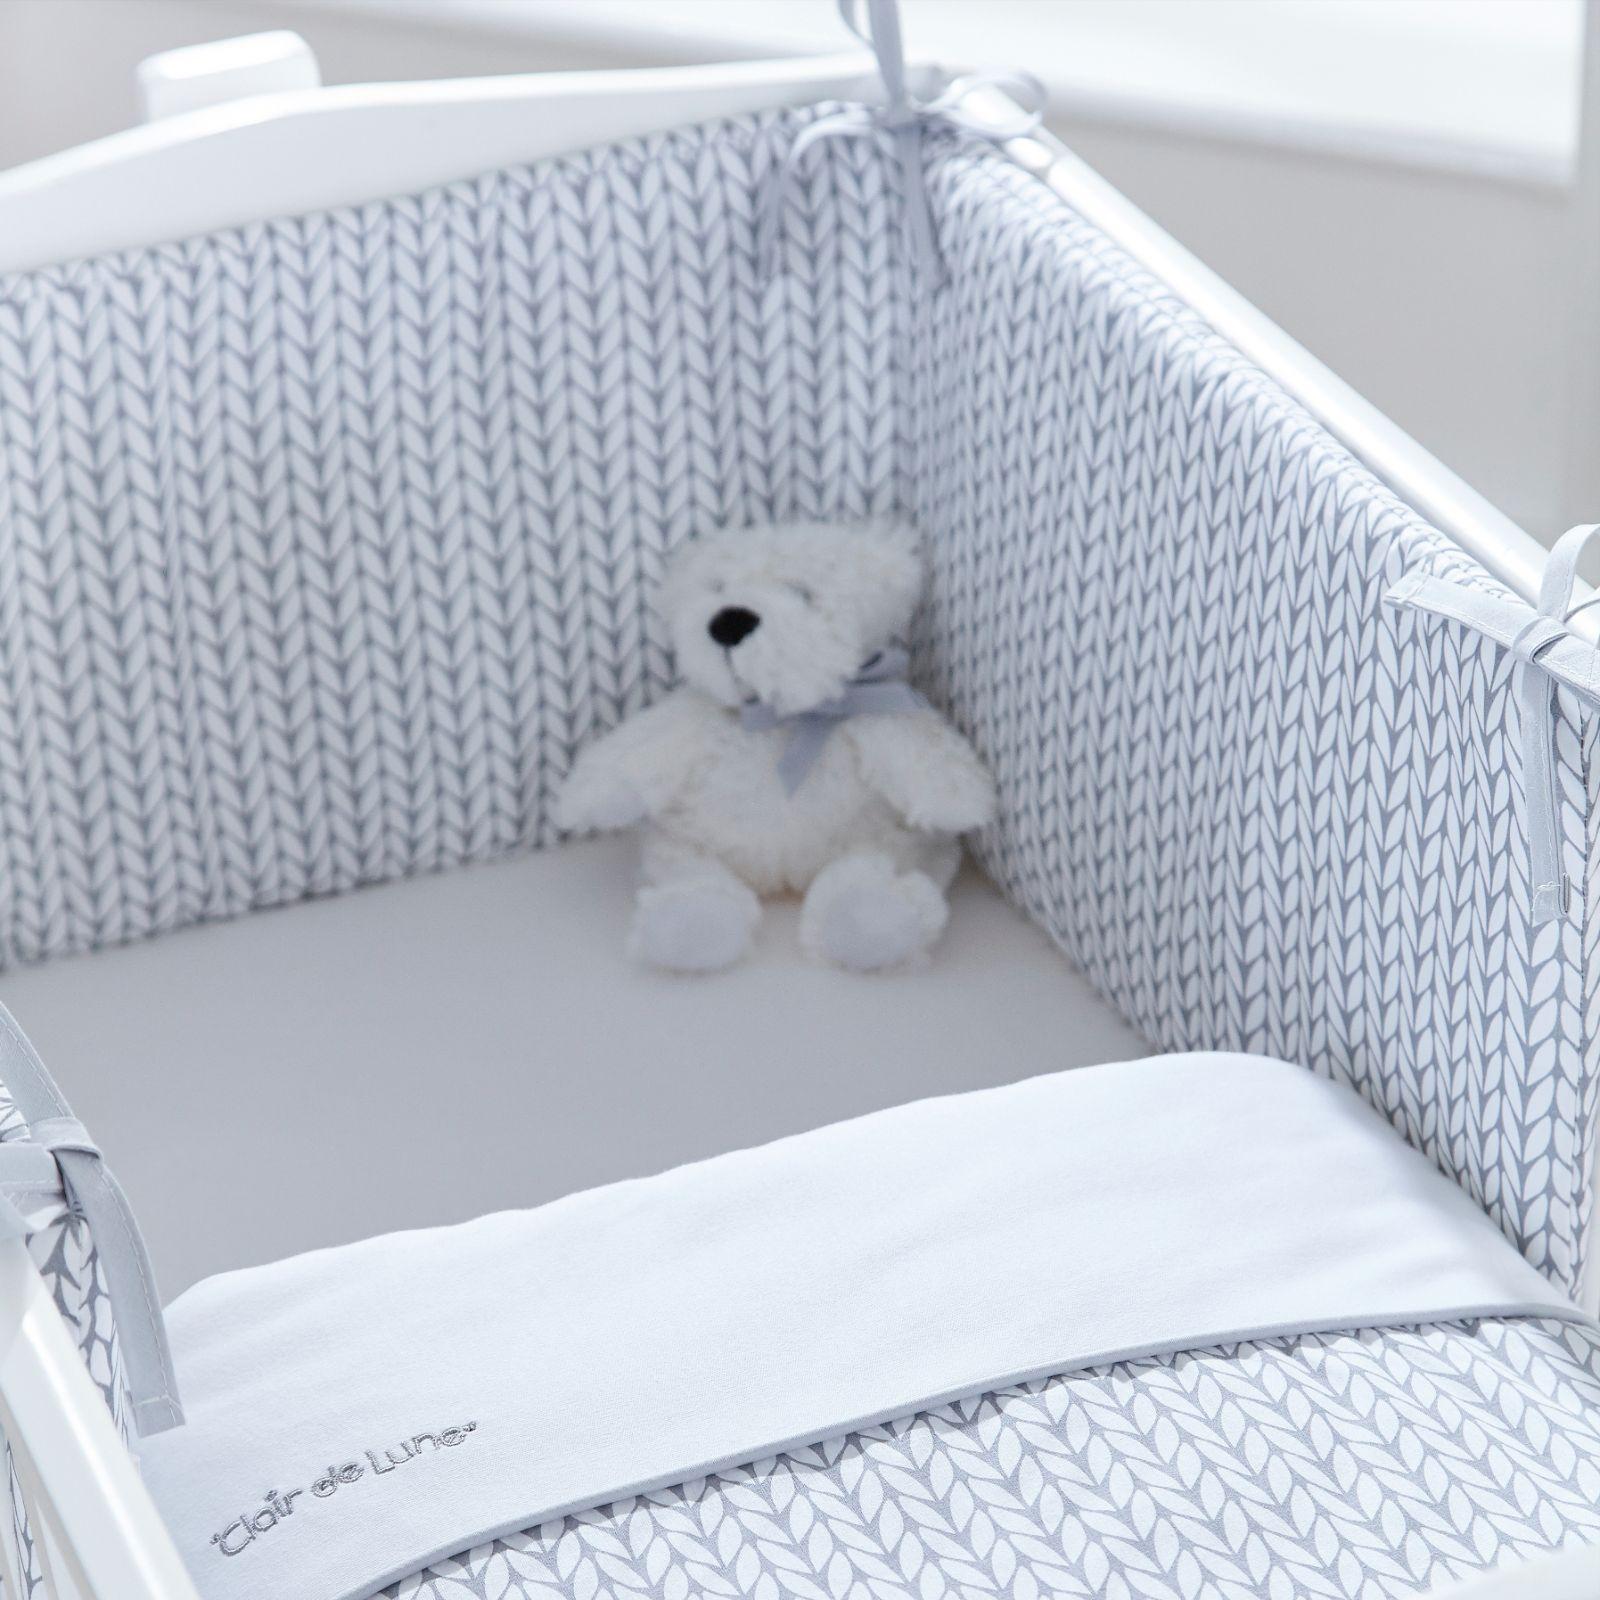 442db1a9ded77 Clair De Lune Rocking Crib Quilt   Bumper Set - Barley Bebe Grey ...